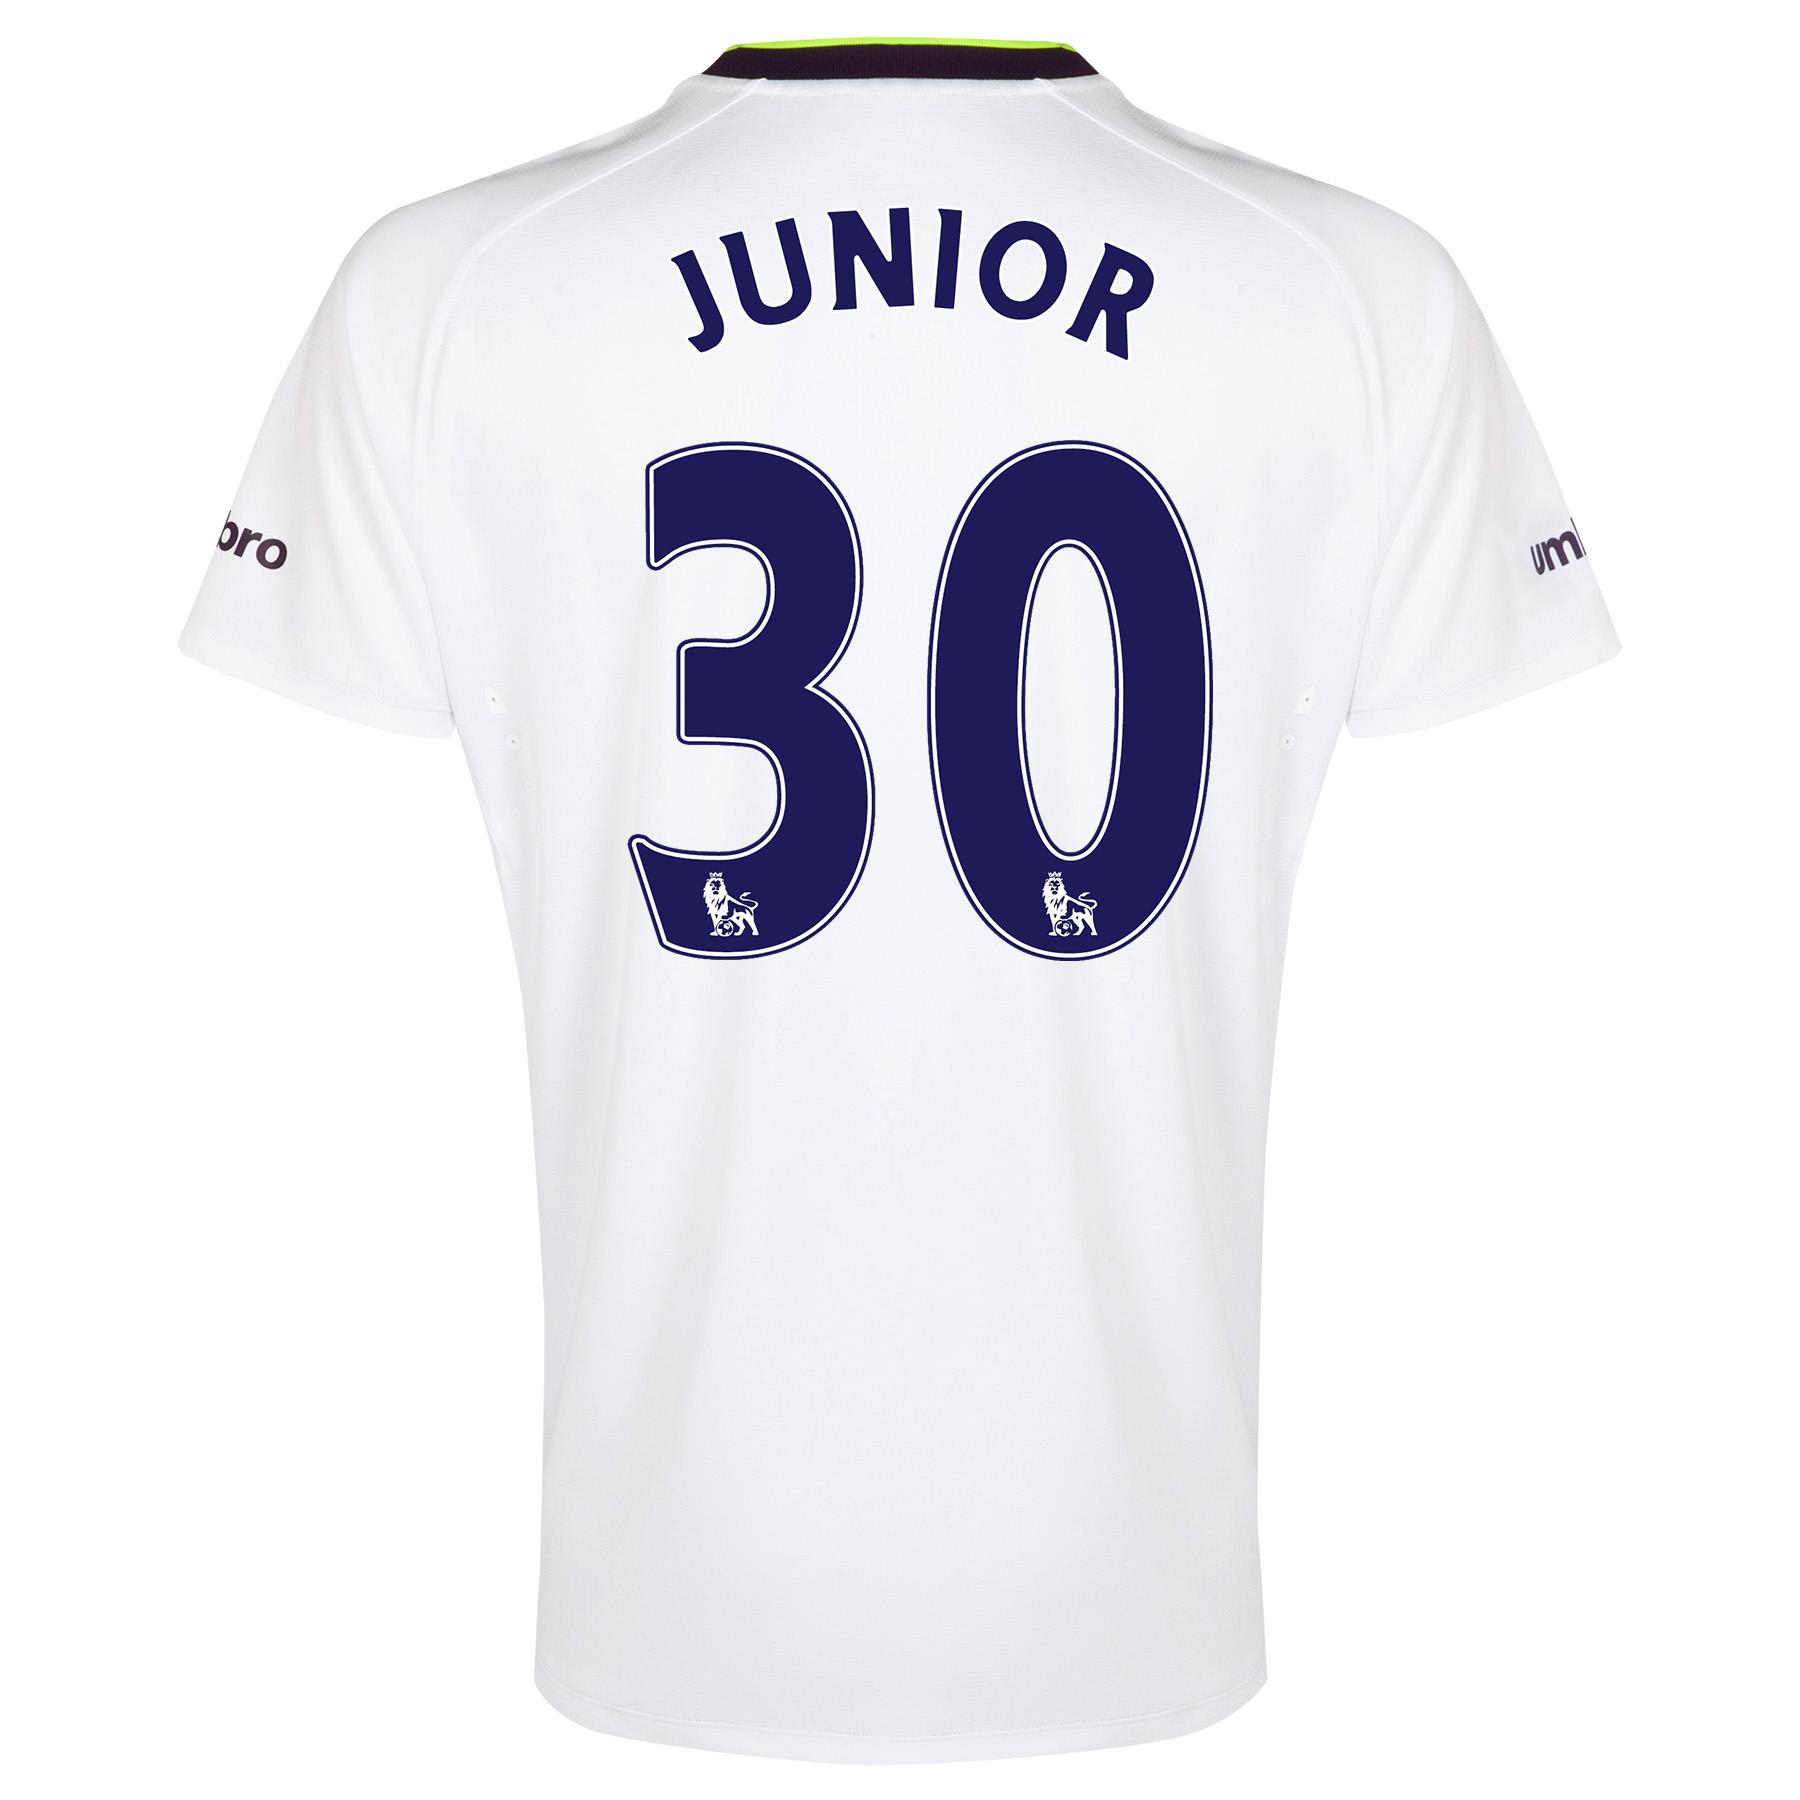 Everton SS 3rd Shirt 2014/15 - Junior with Junior 30 printing